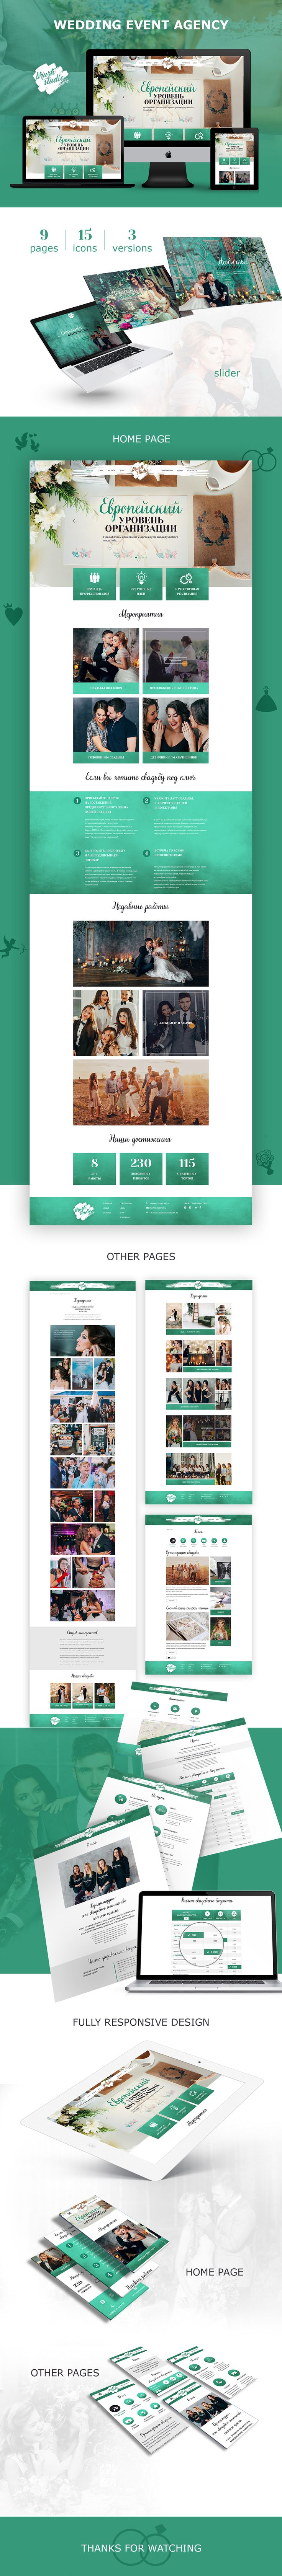 website wedding agency on Behance